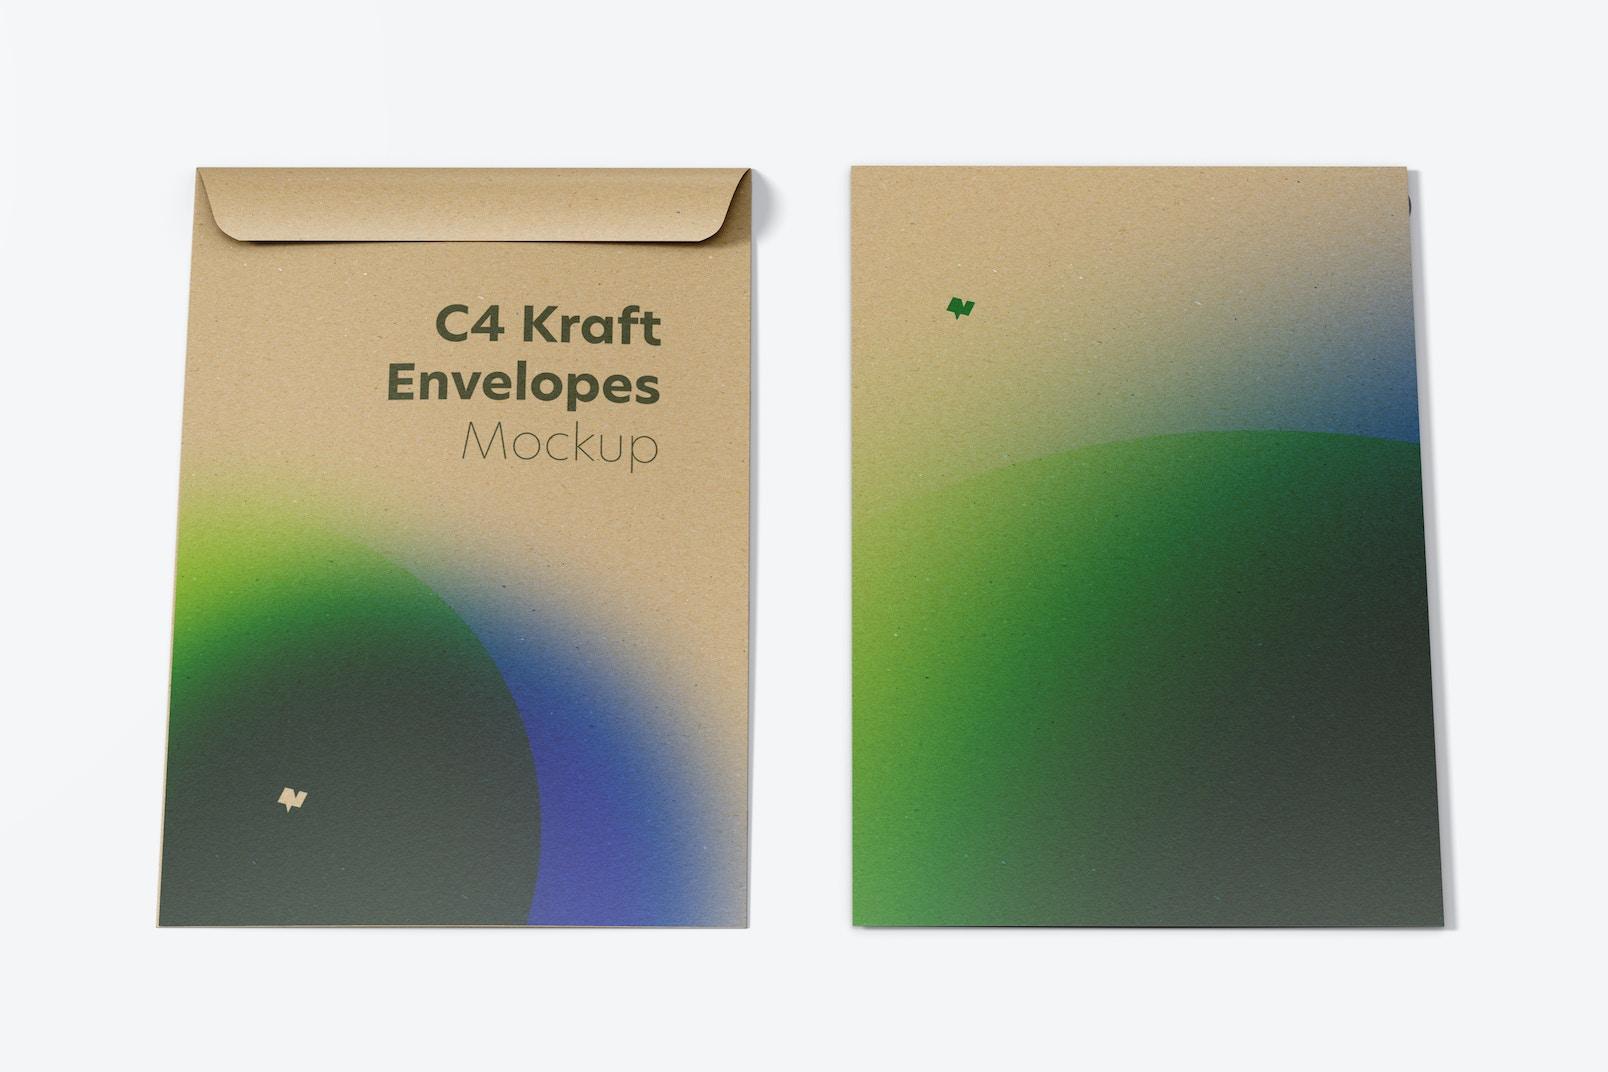 C4 Kraft Envelopes Mockup, Front View